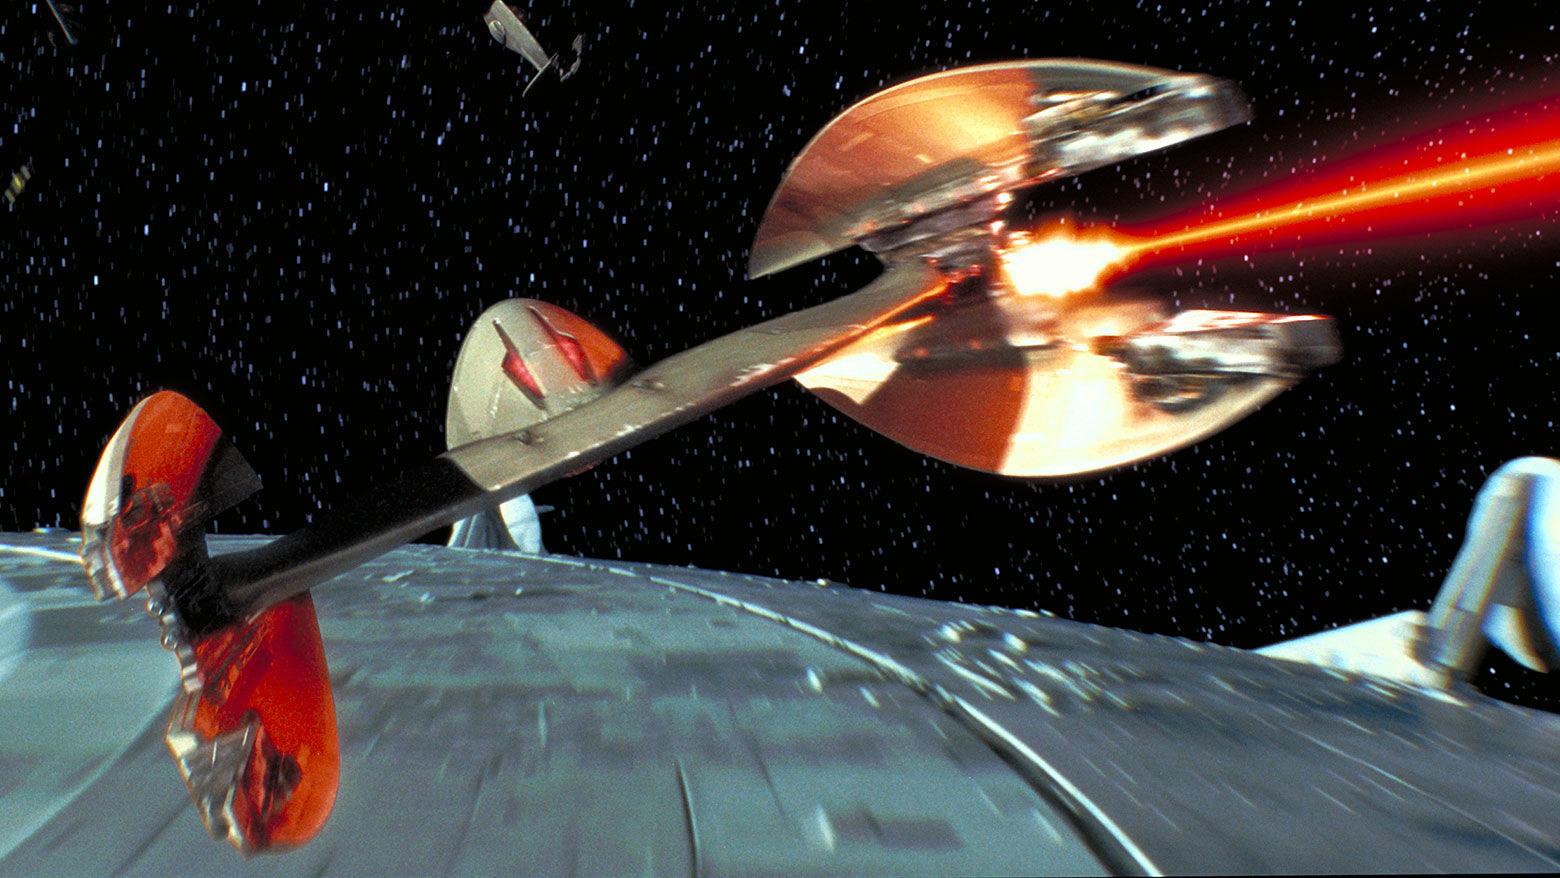 droid-saldiri-gemisi_Swe